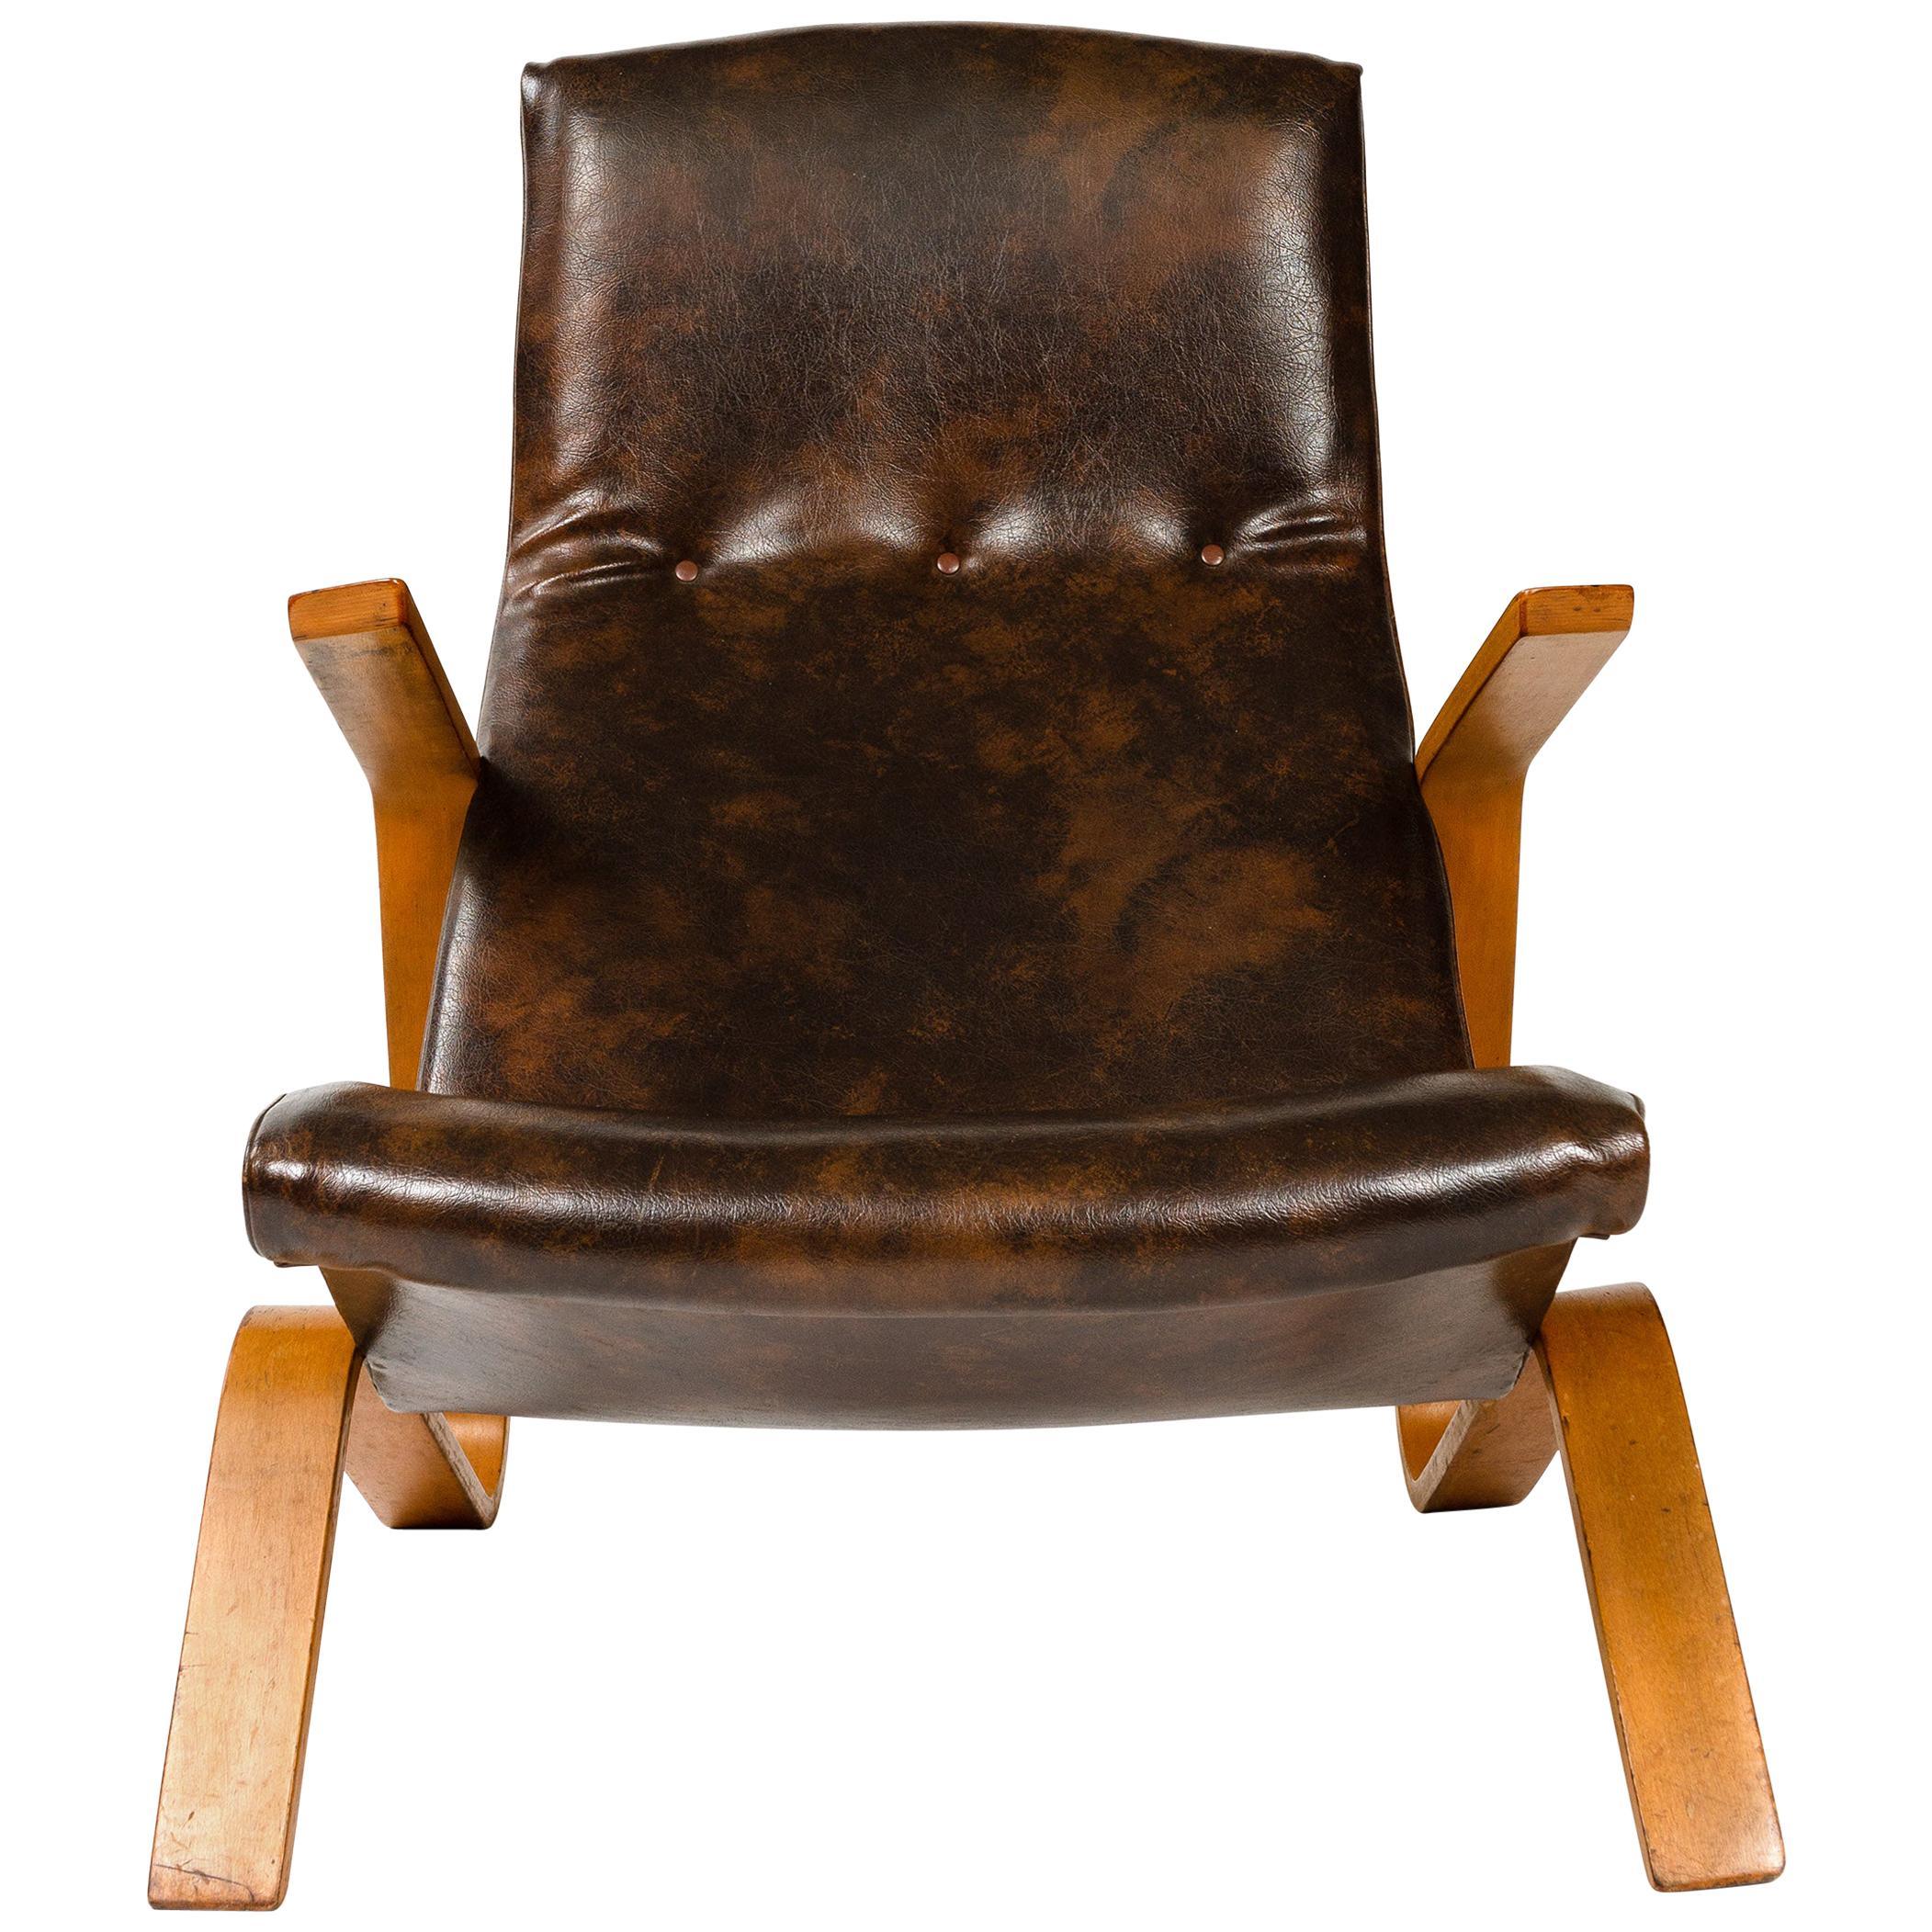 1940s Grasshopper Chair by Eero Saarinen for Knoll